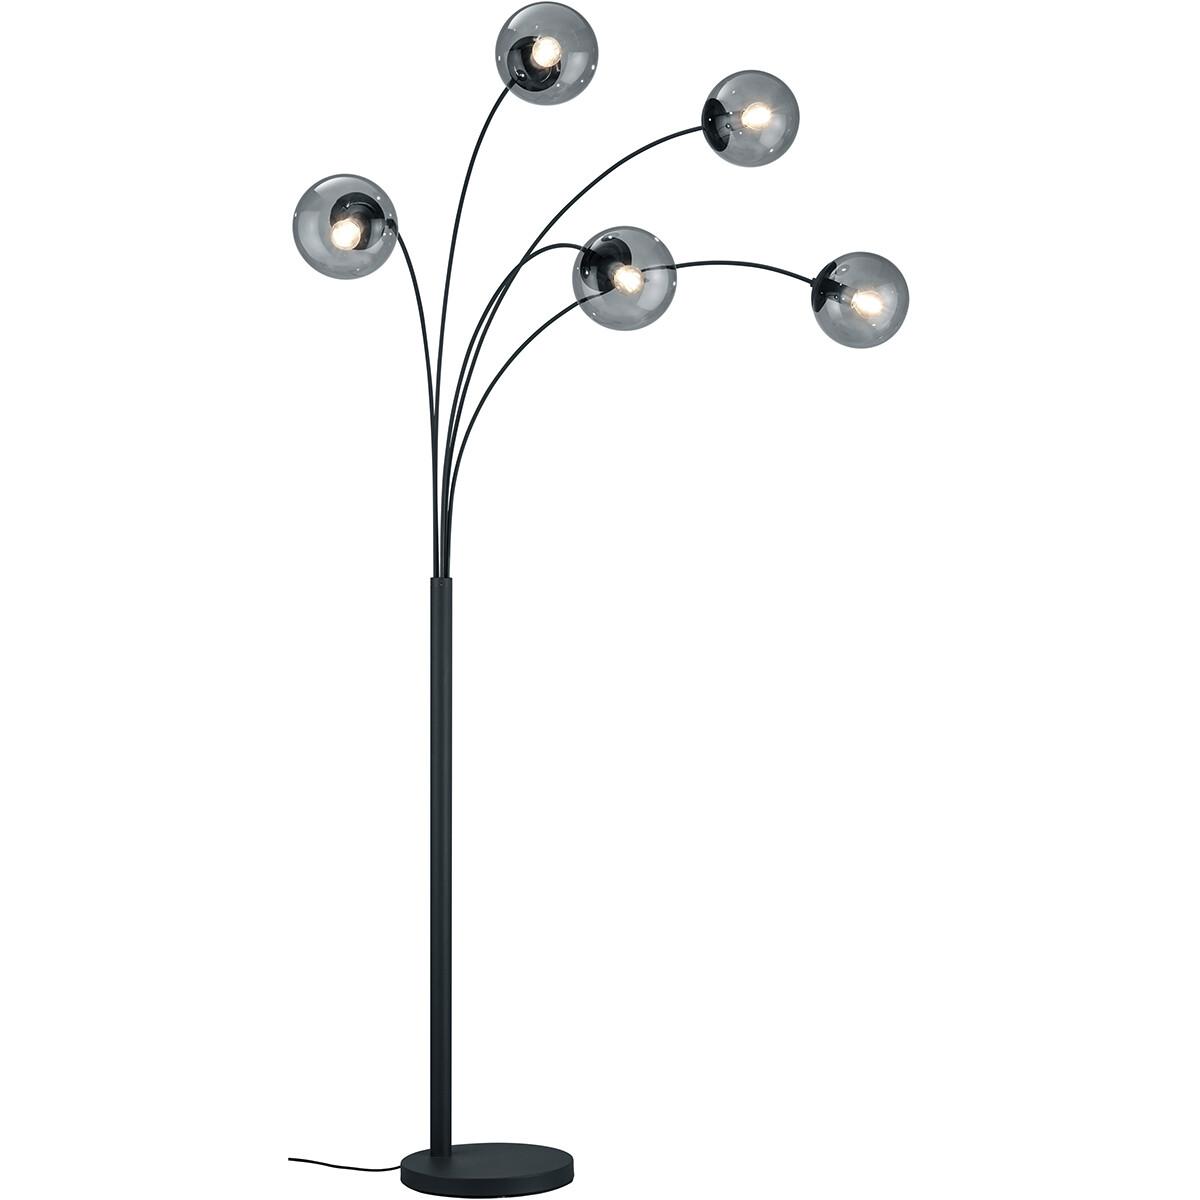 LED Vloerlamp - Trion Balina - E14 Fitting - Rond - Mat Zwart - Aluminium